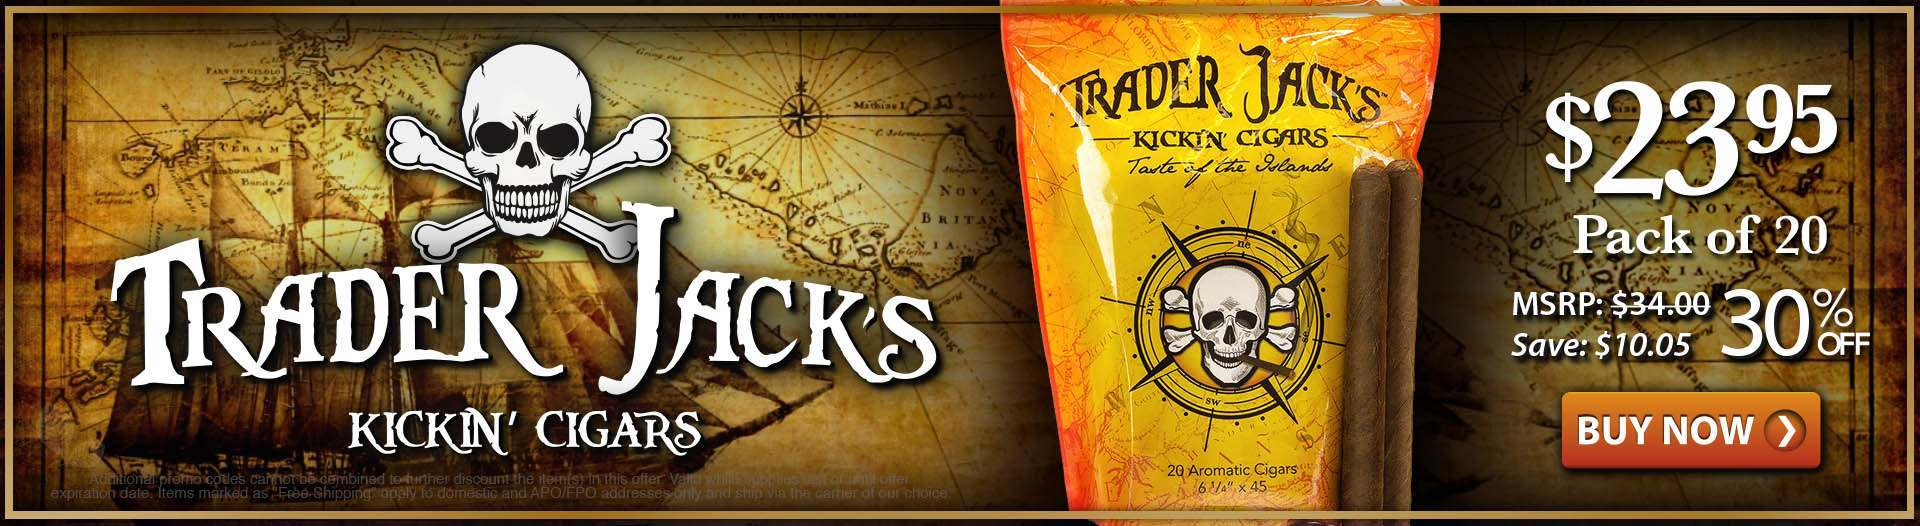 Trader Jack's Kickin' Cigars